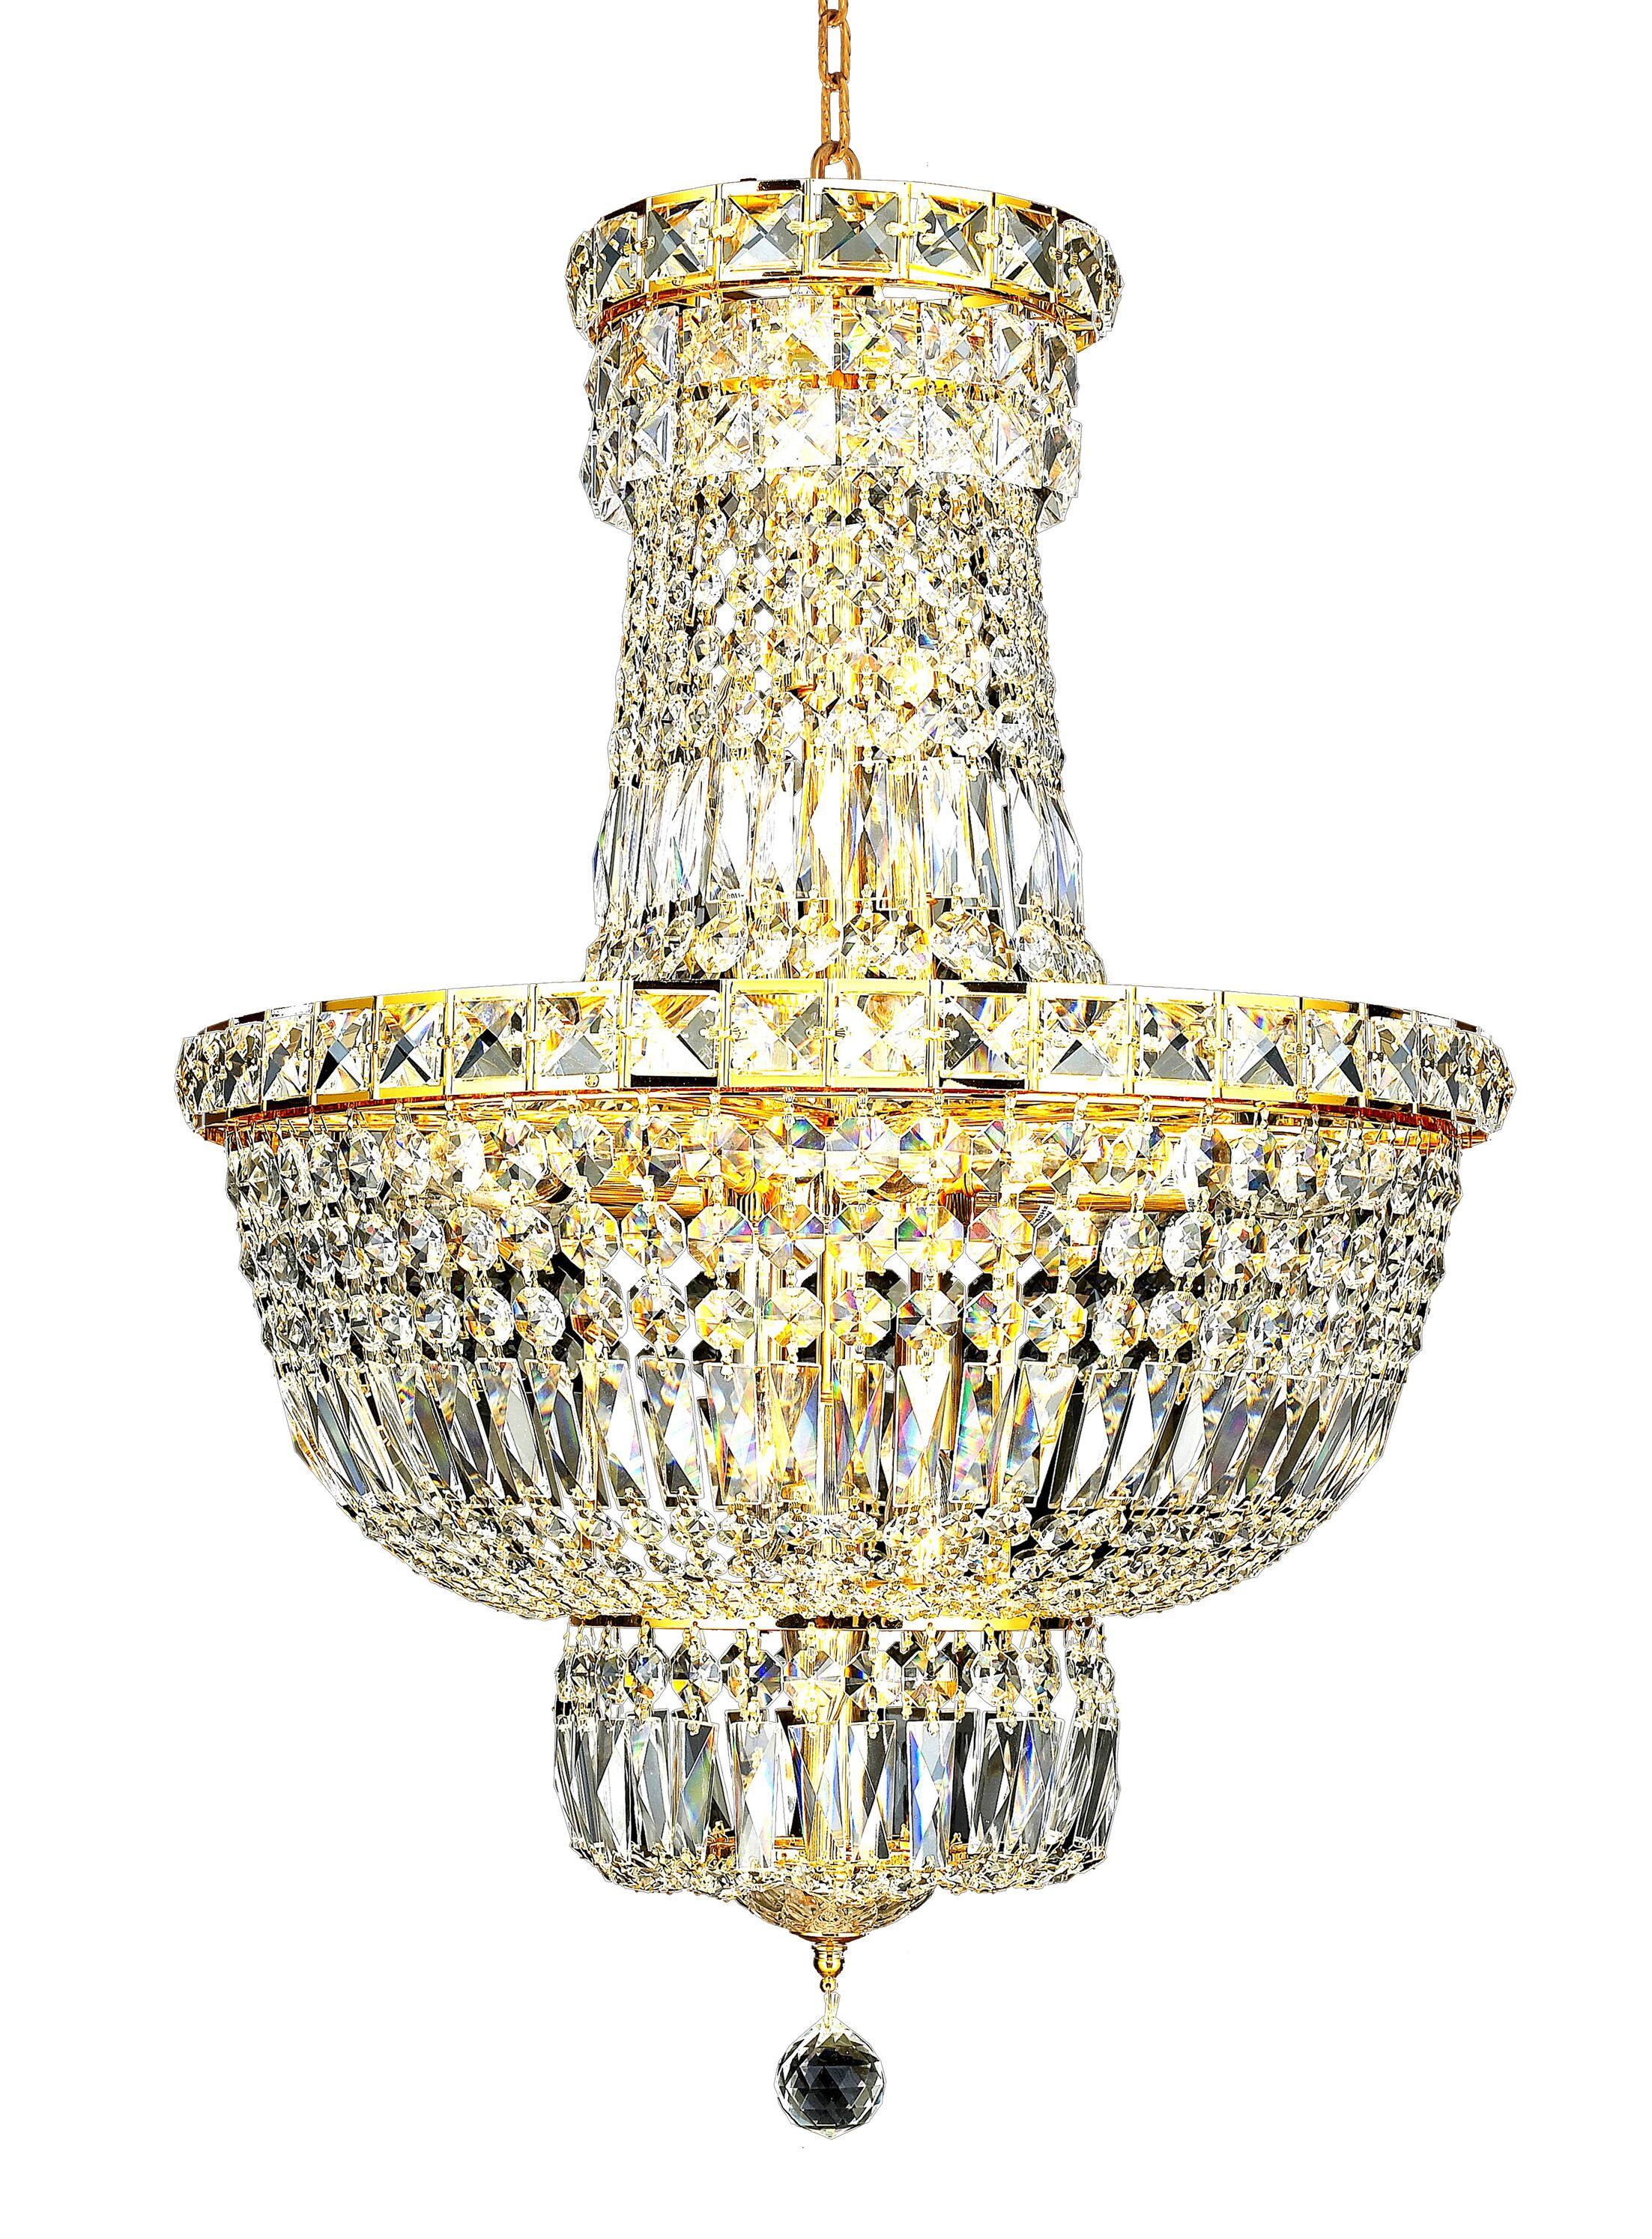 Fulham 12-Light Empire Chandelier Finish: Gold, Crystal: Spectra Swarovski